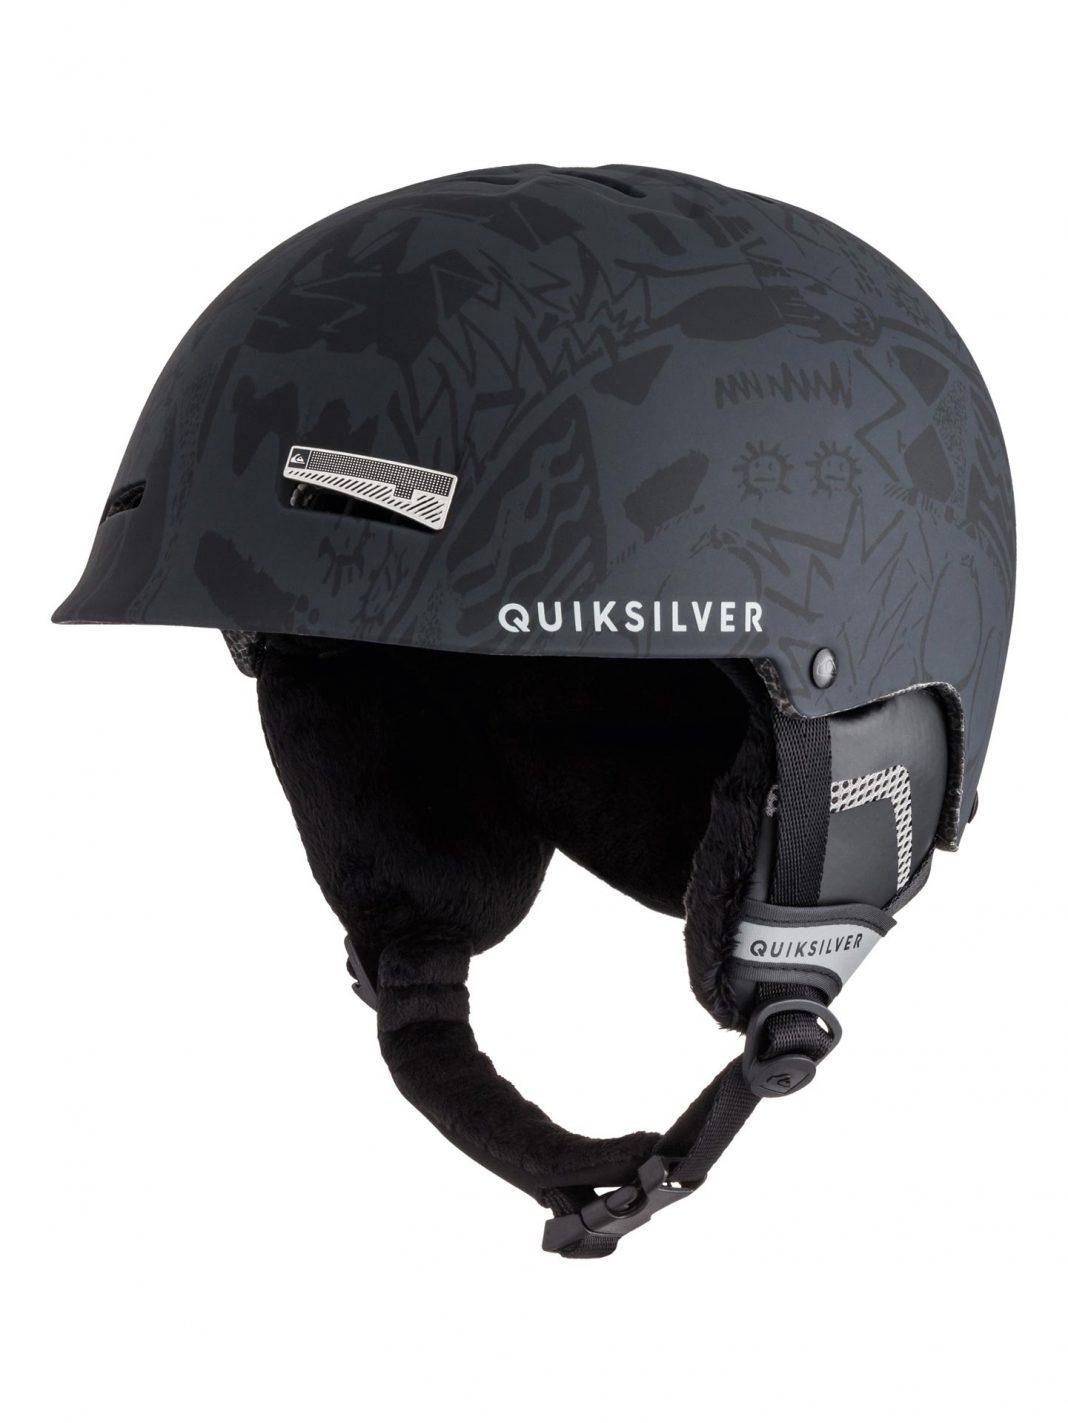 Quiksilver: Skylab 2.0